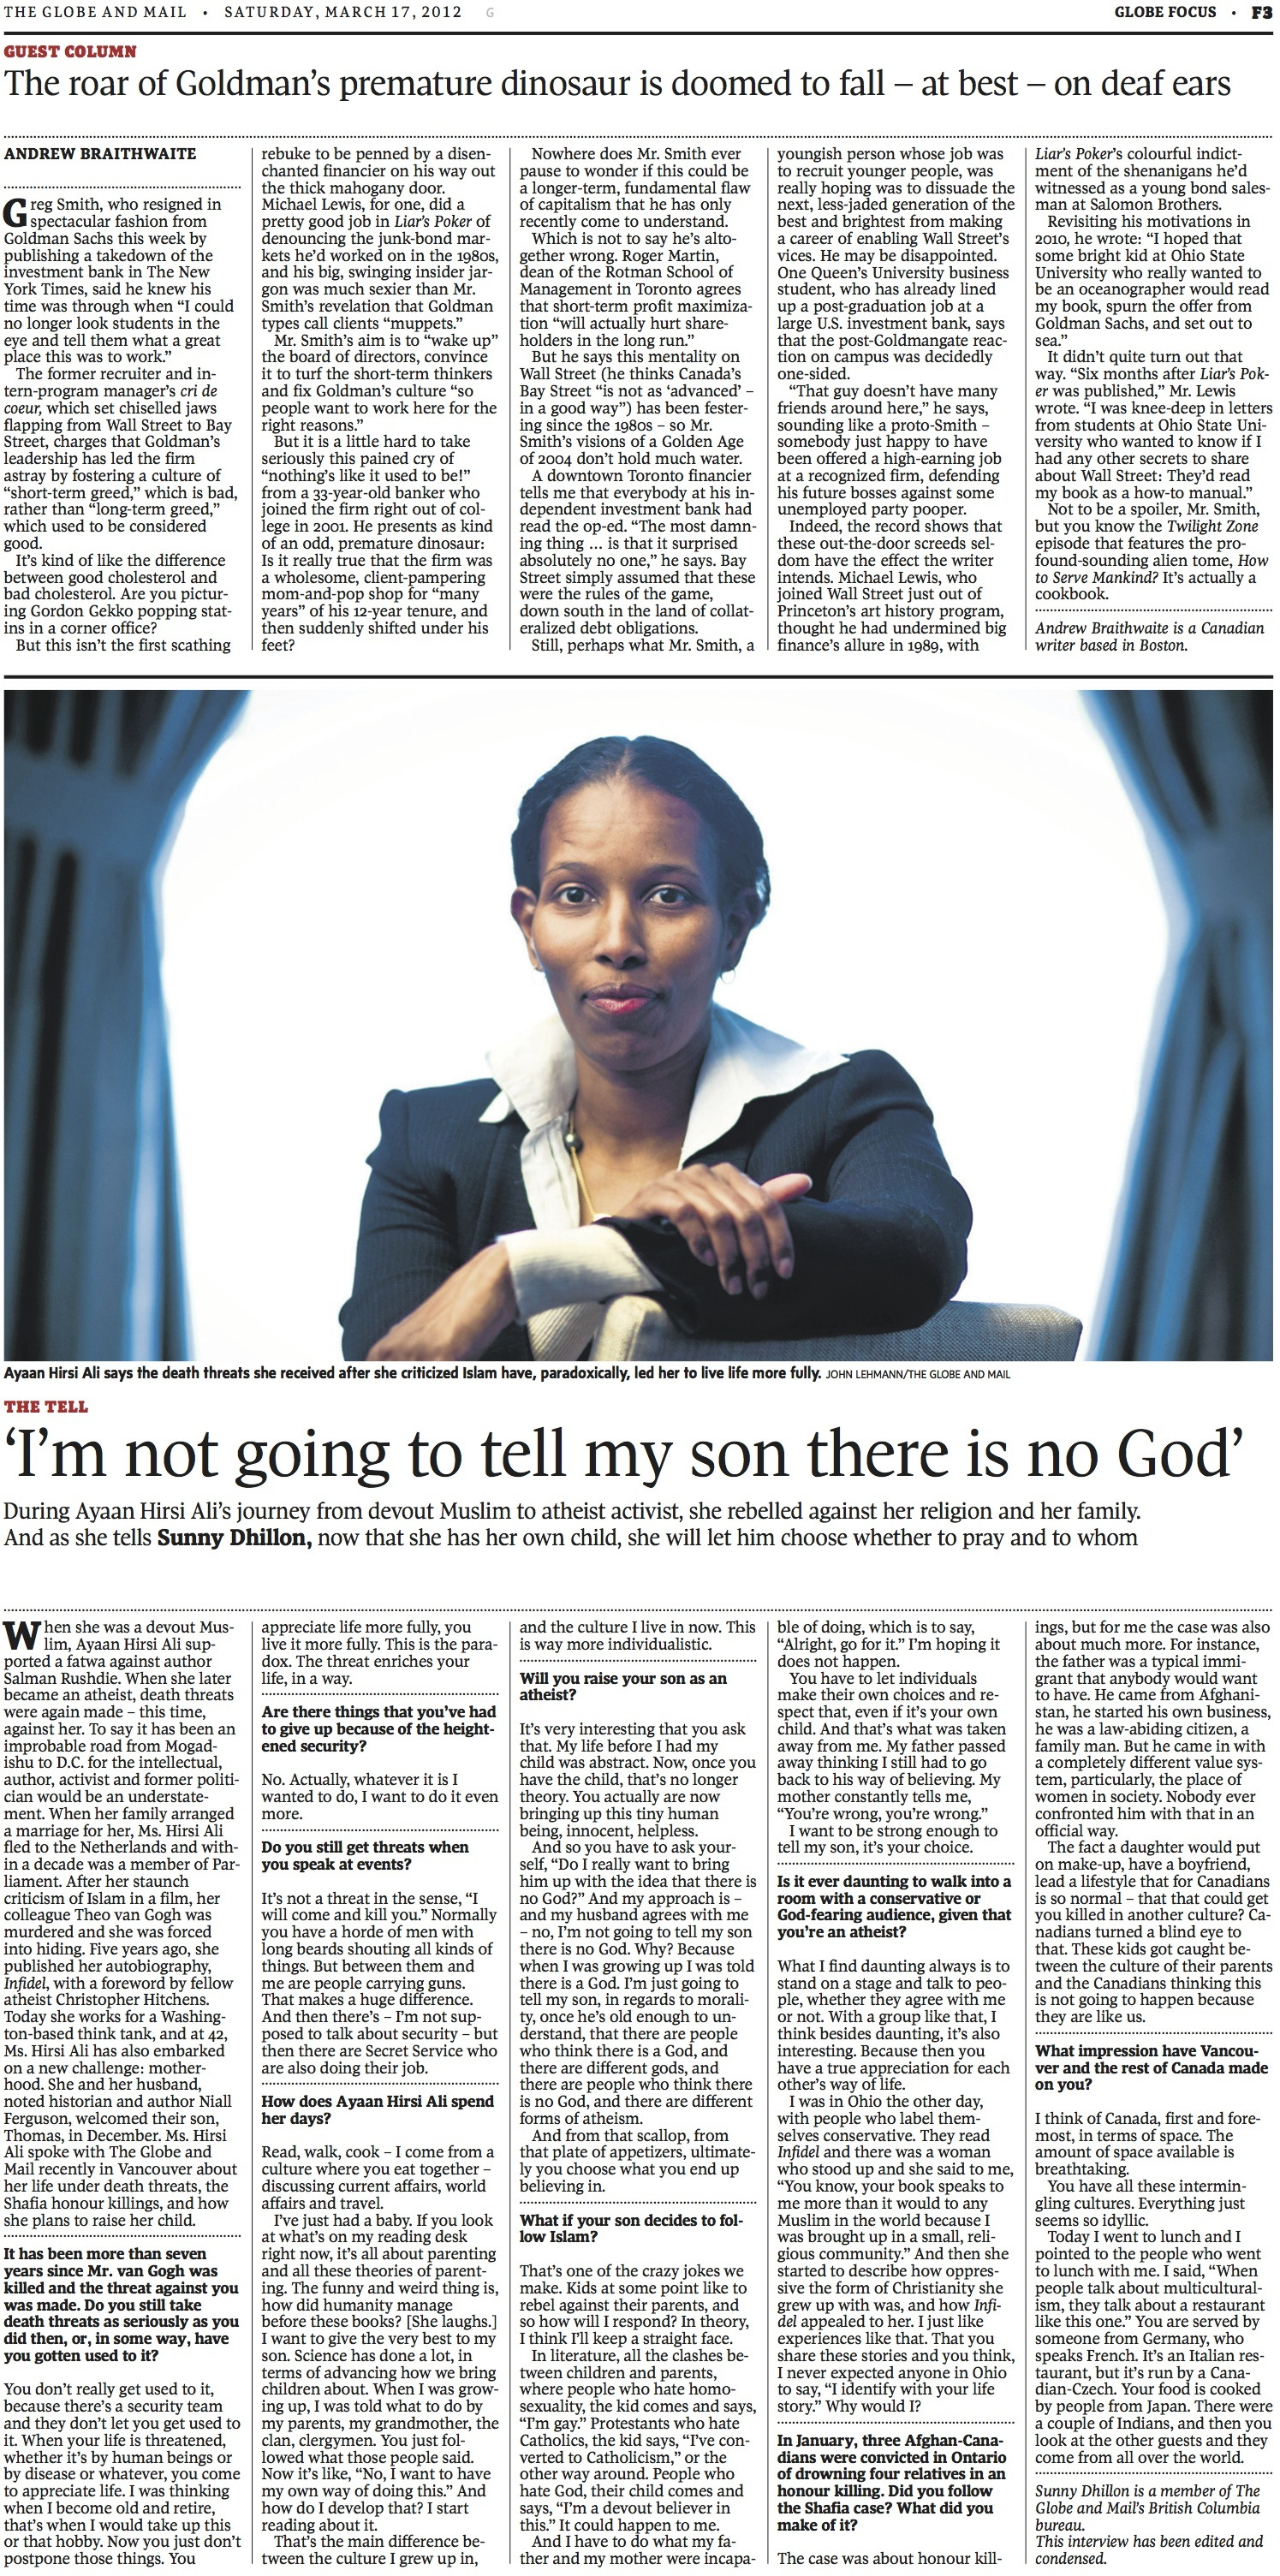 Goldman's Premature Dinosaur // The Globe and Mail // 2012 // web